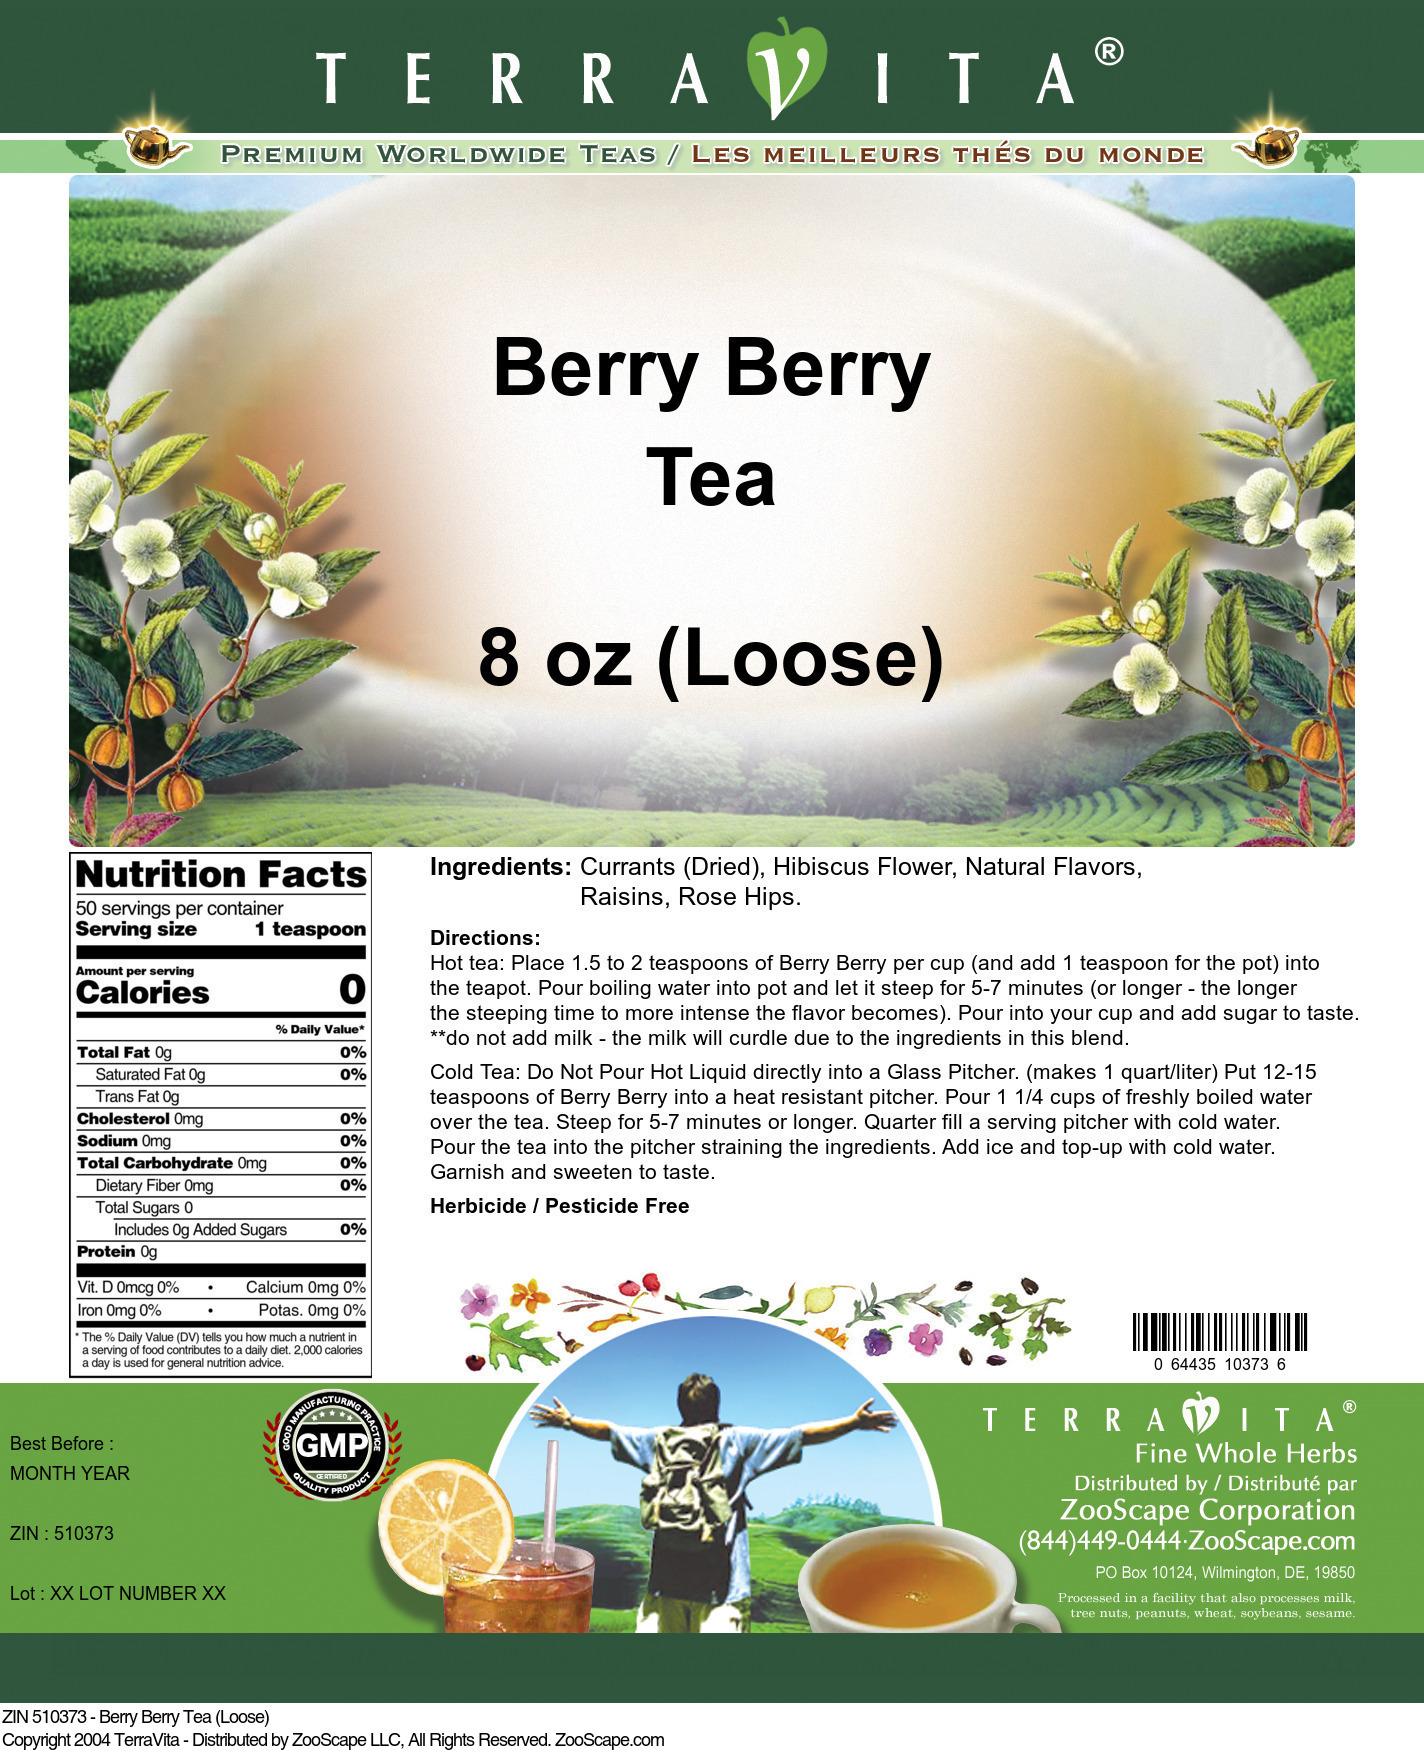 Berry Berry Tea (Loose)